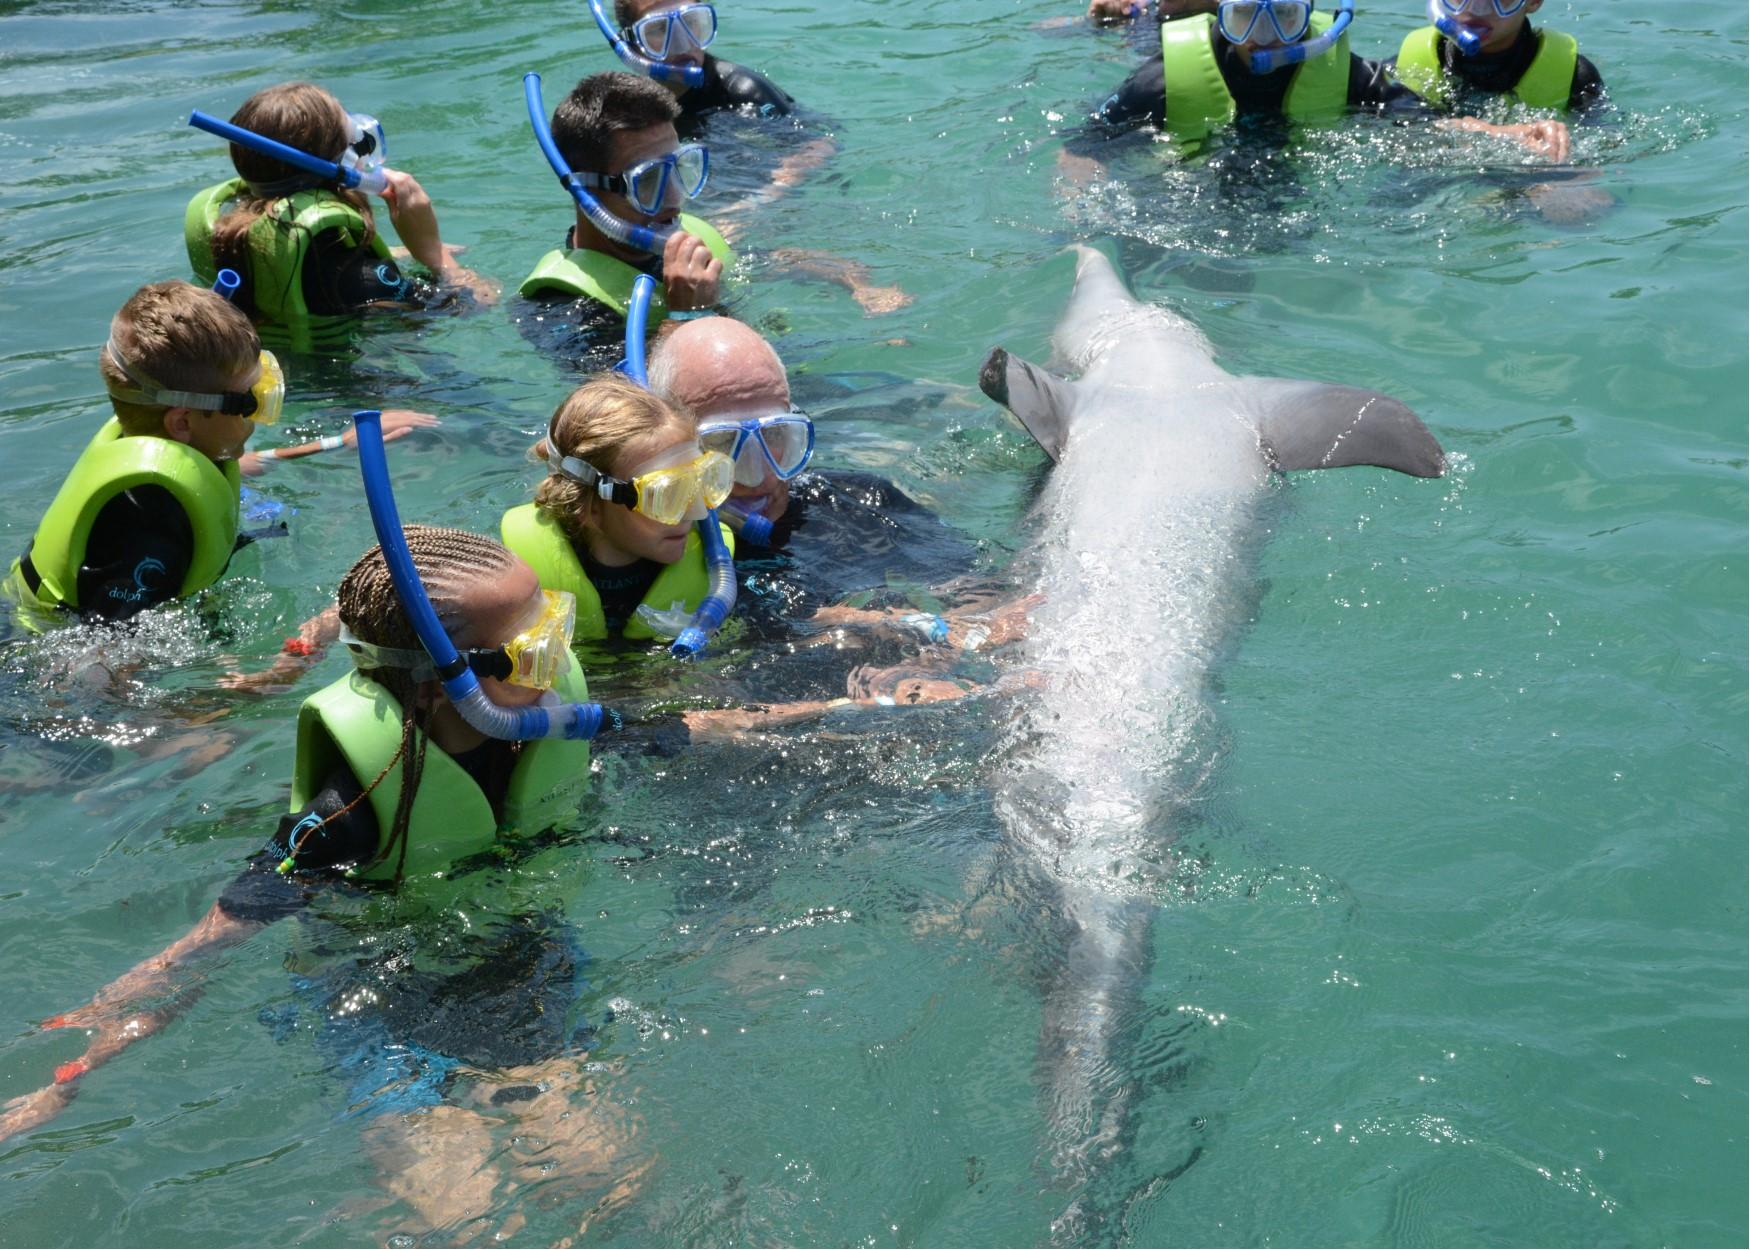 pops hallie pet dolphin.jpg